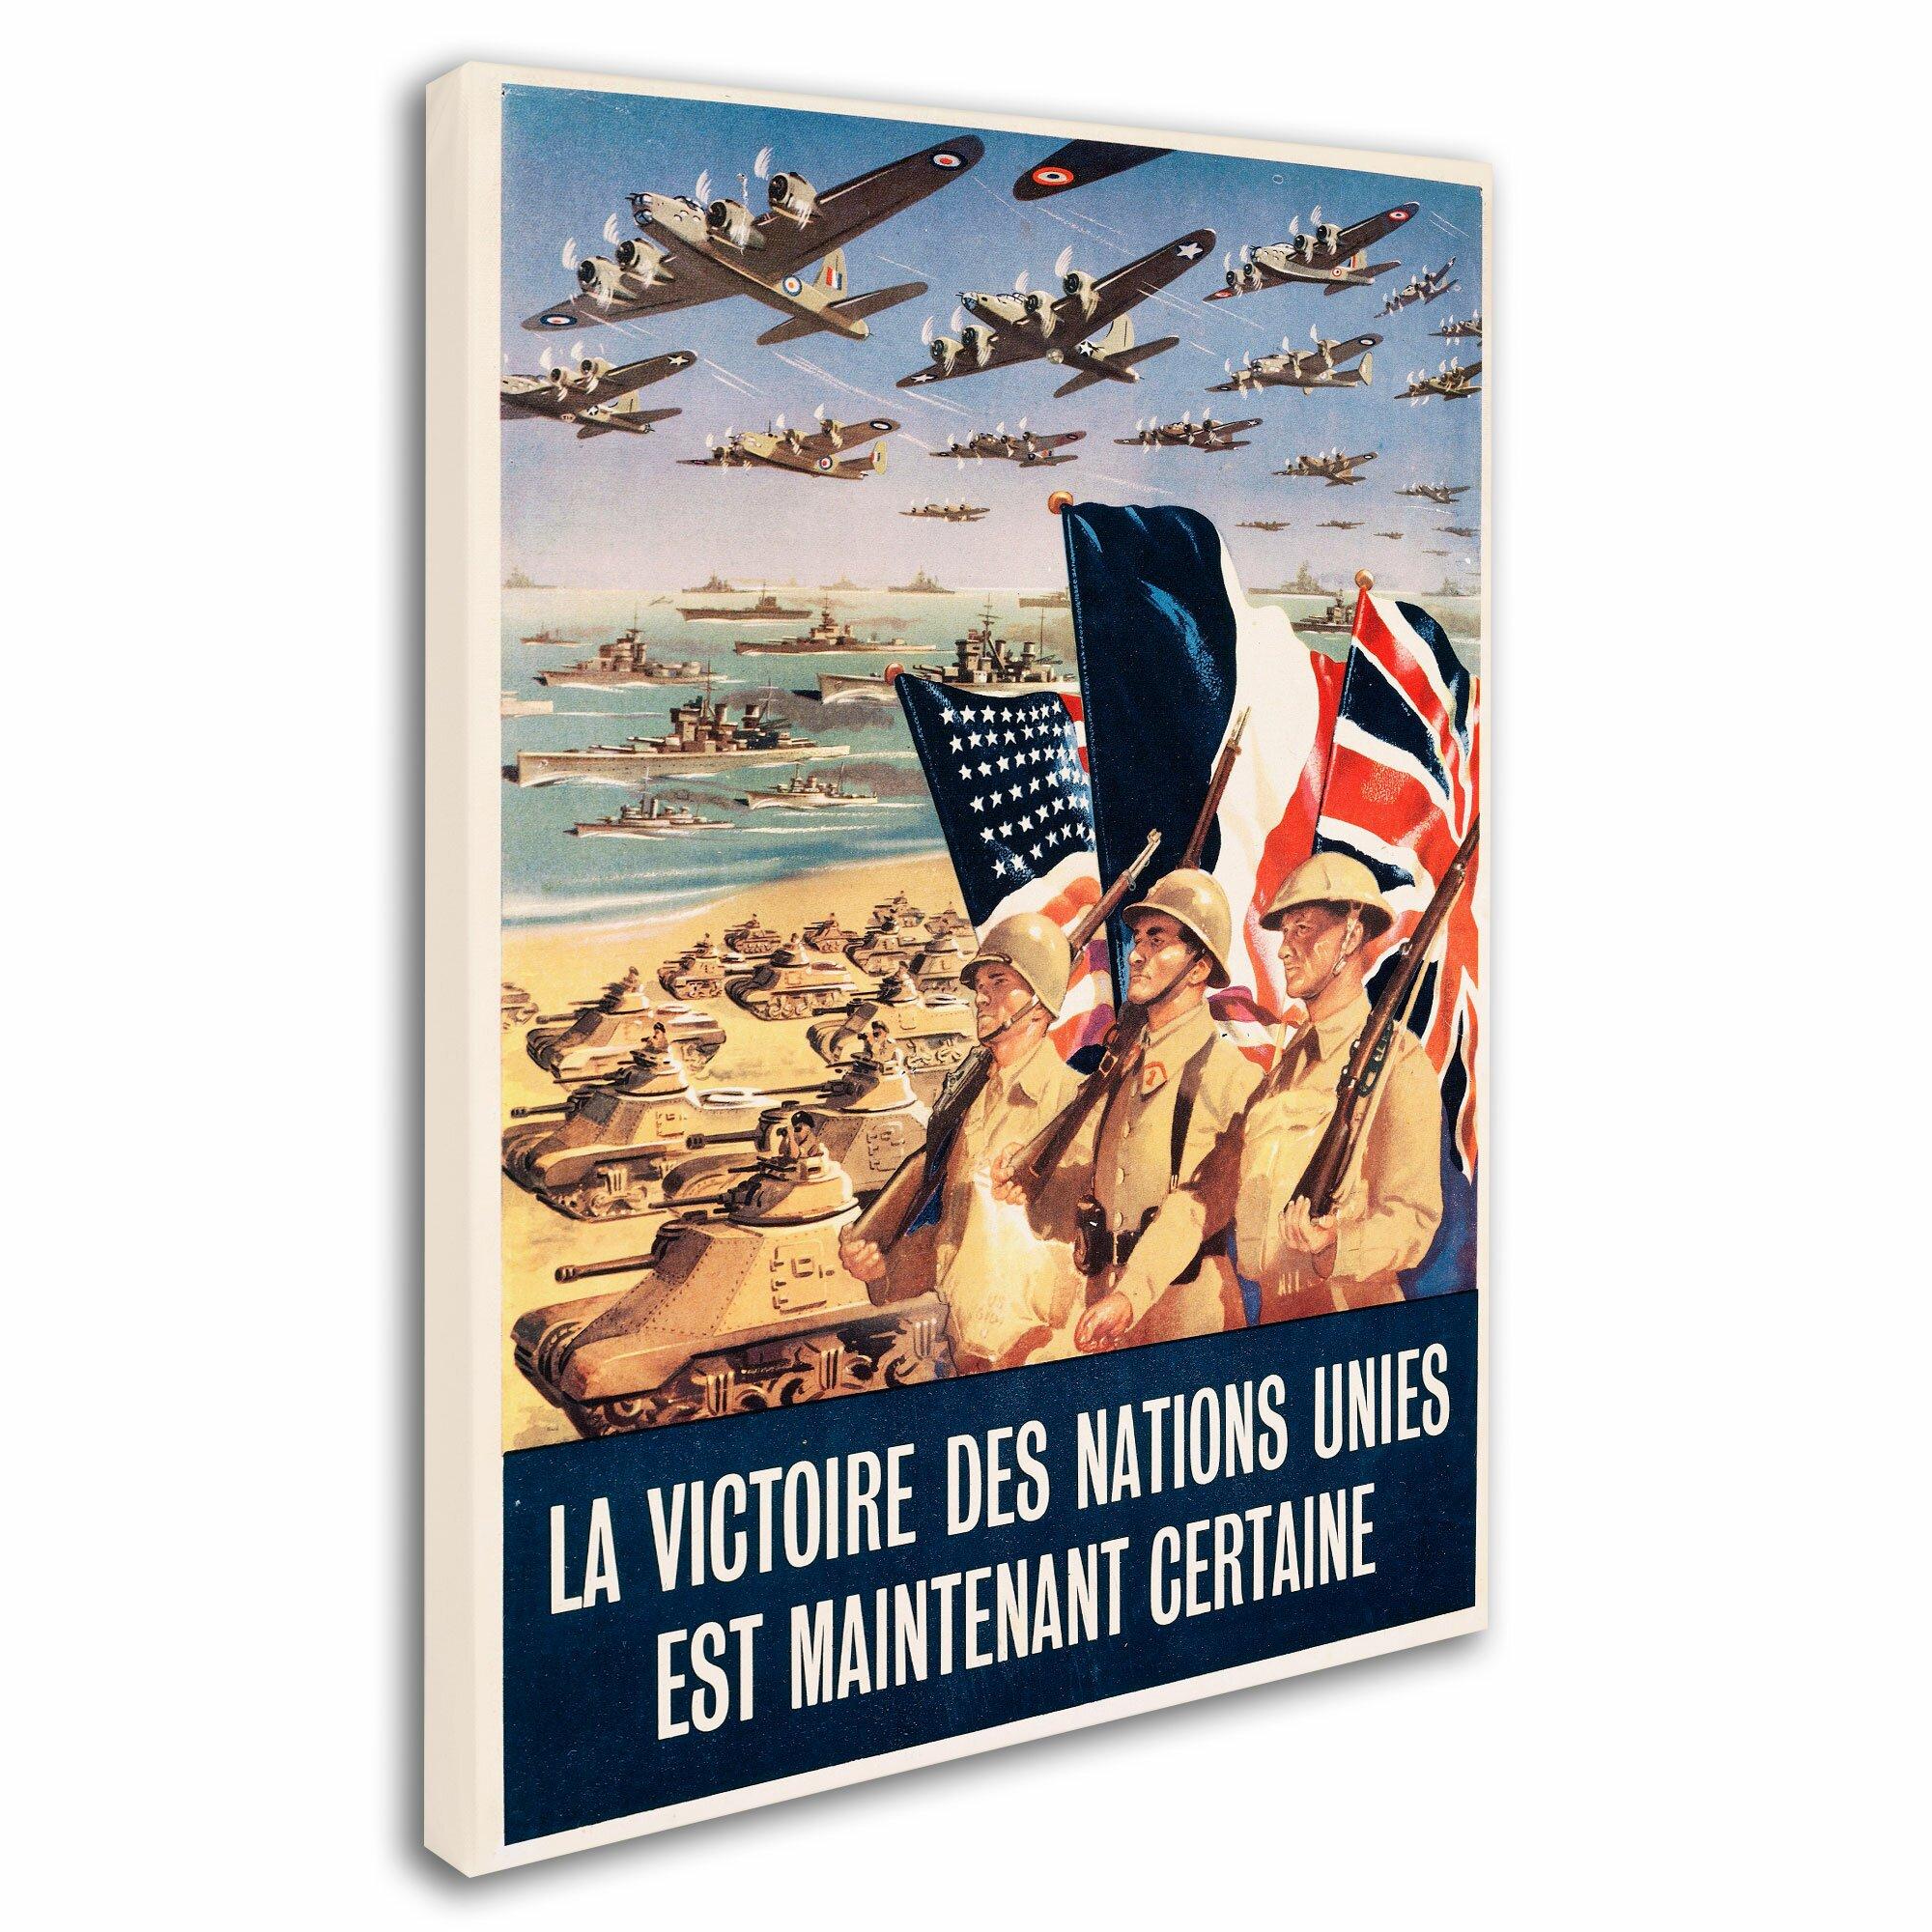 Trademark Art French Propaganda Poster From World War Ii